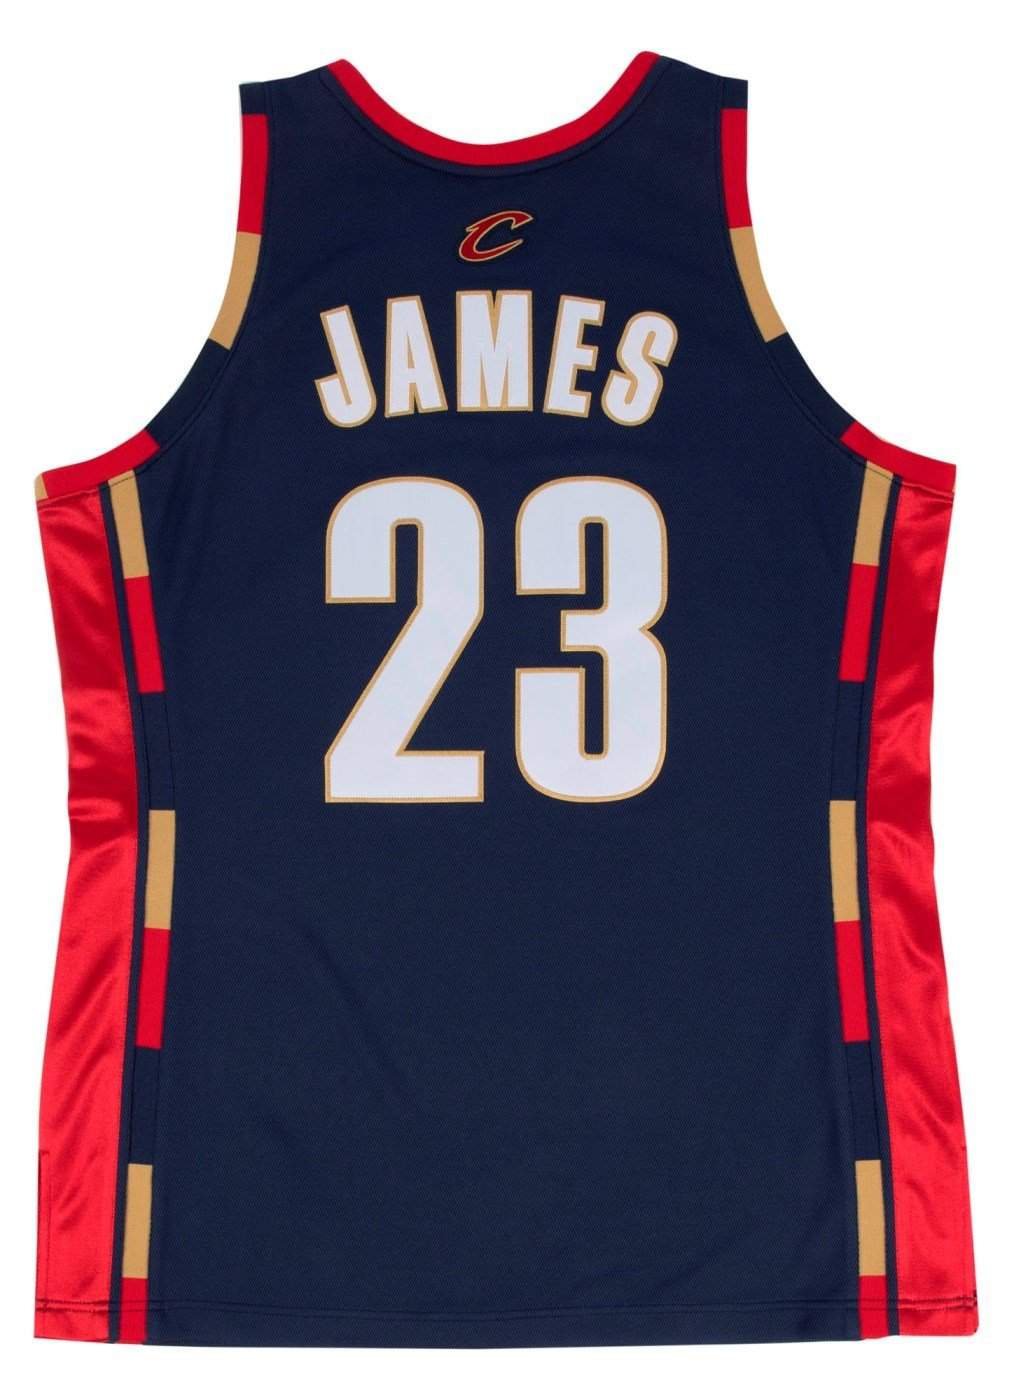 Lebron James Cleveland Cavaliers Mitchell & Ness NBA auténtico 2008 azul marino Jersey: Amazon.es: Deportes y aire libre